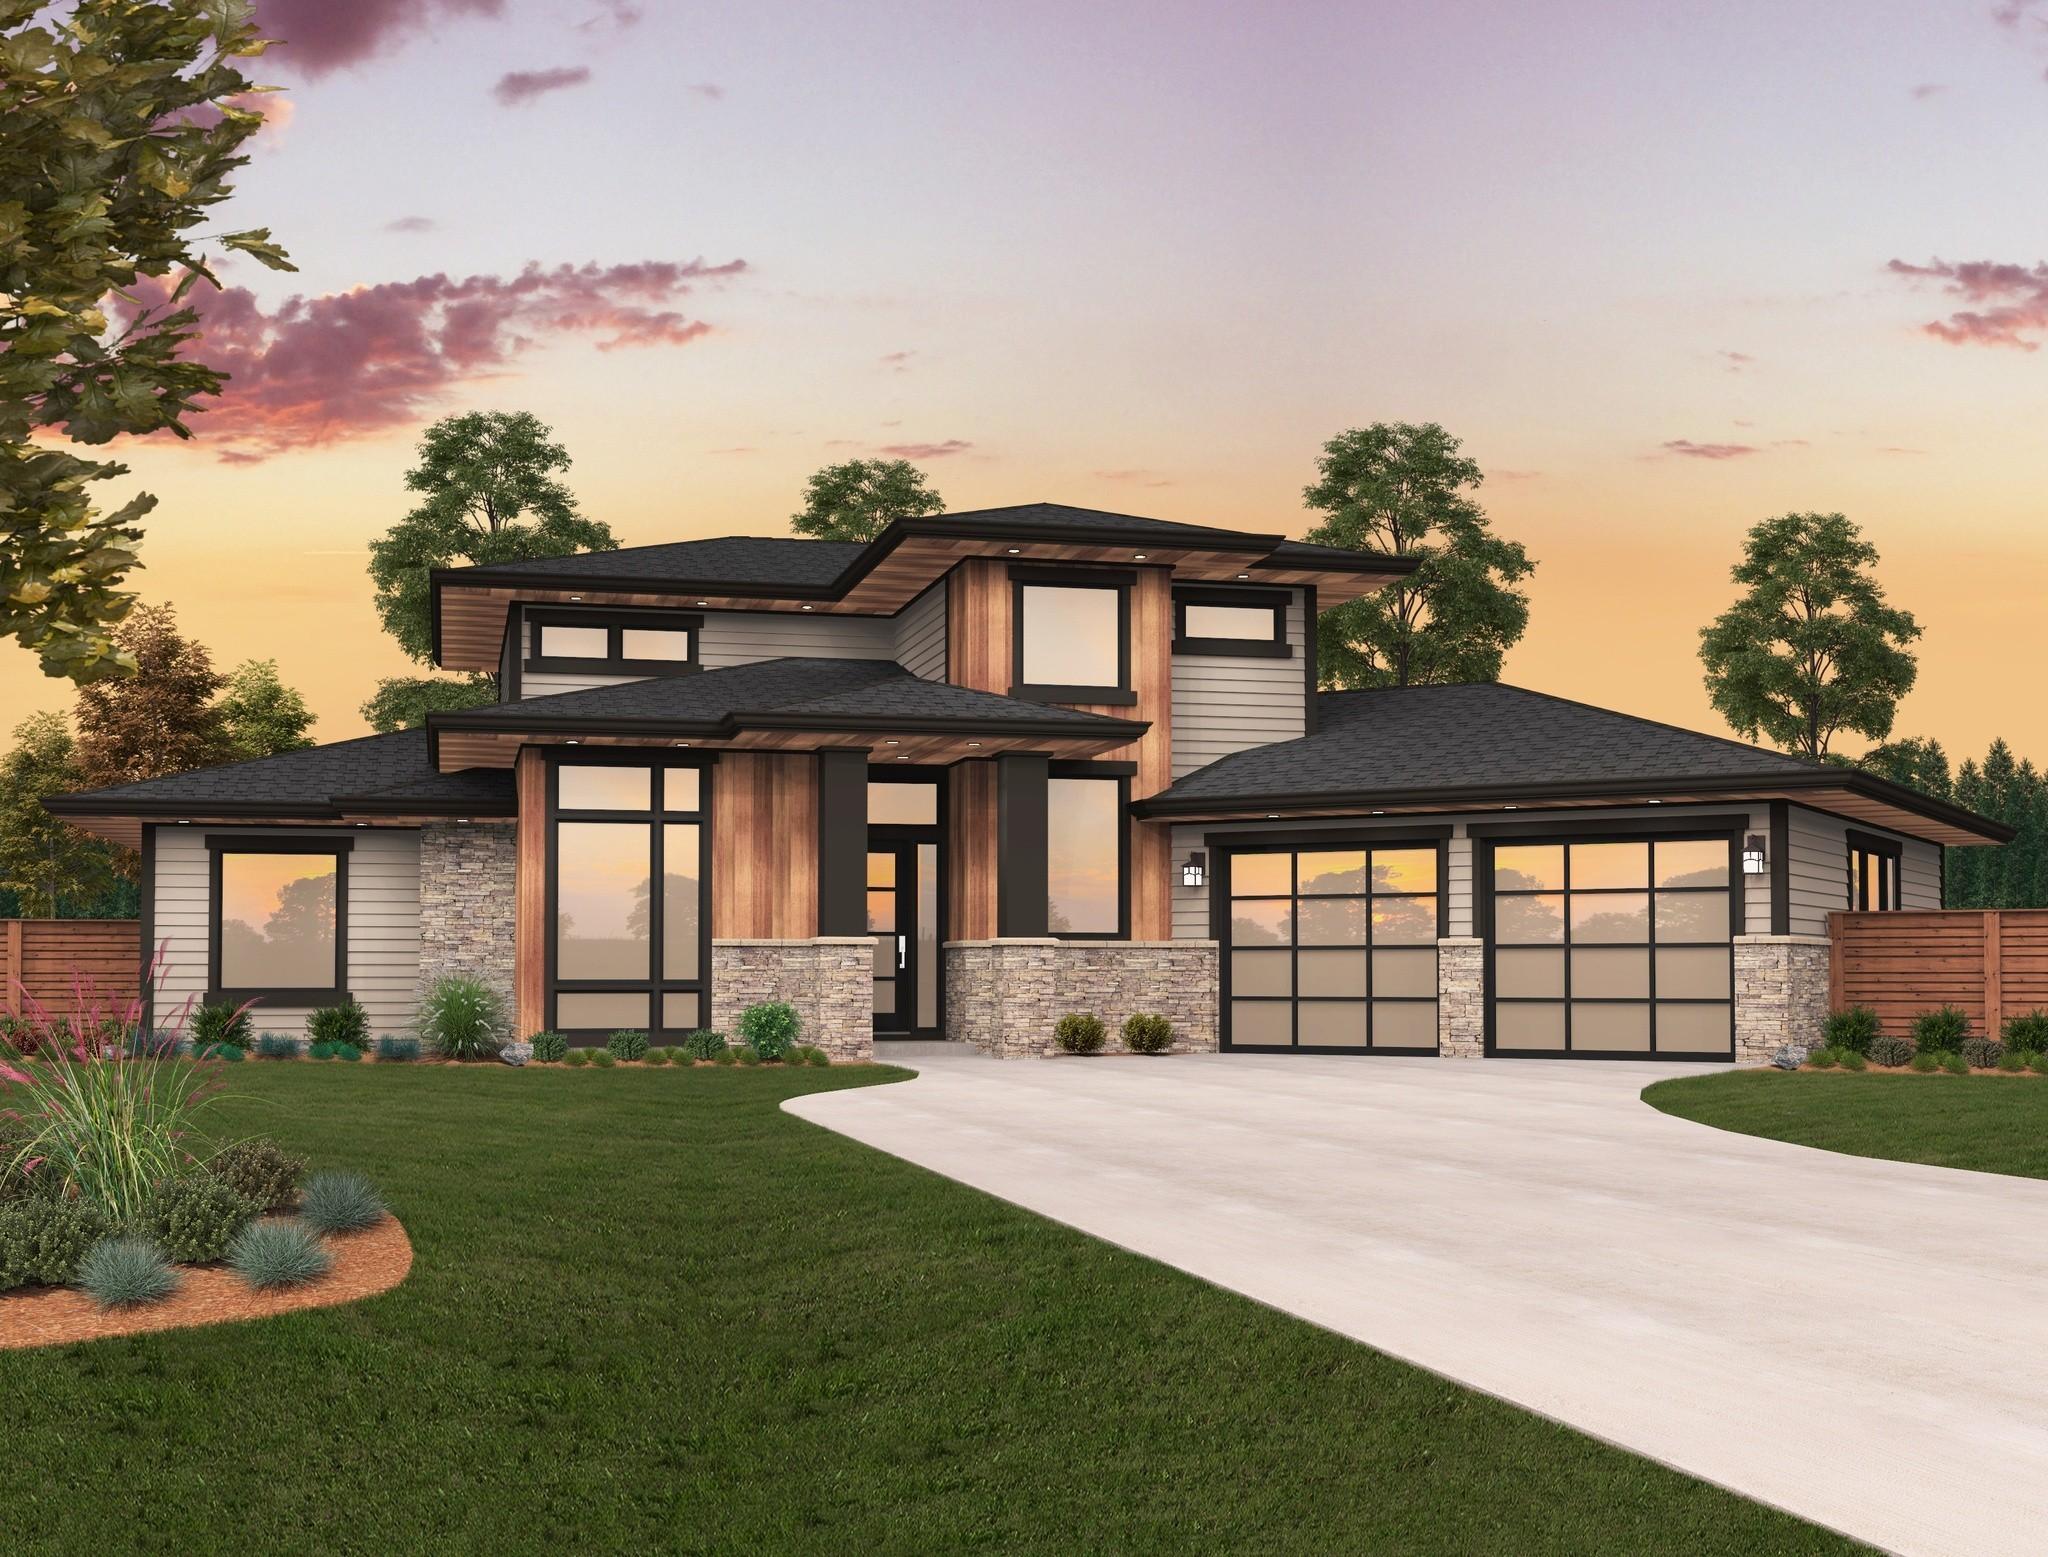 Modern house plan x 16b best selling modern home design for Best selling house plans 2016